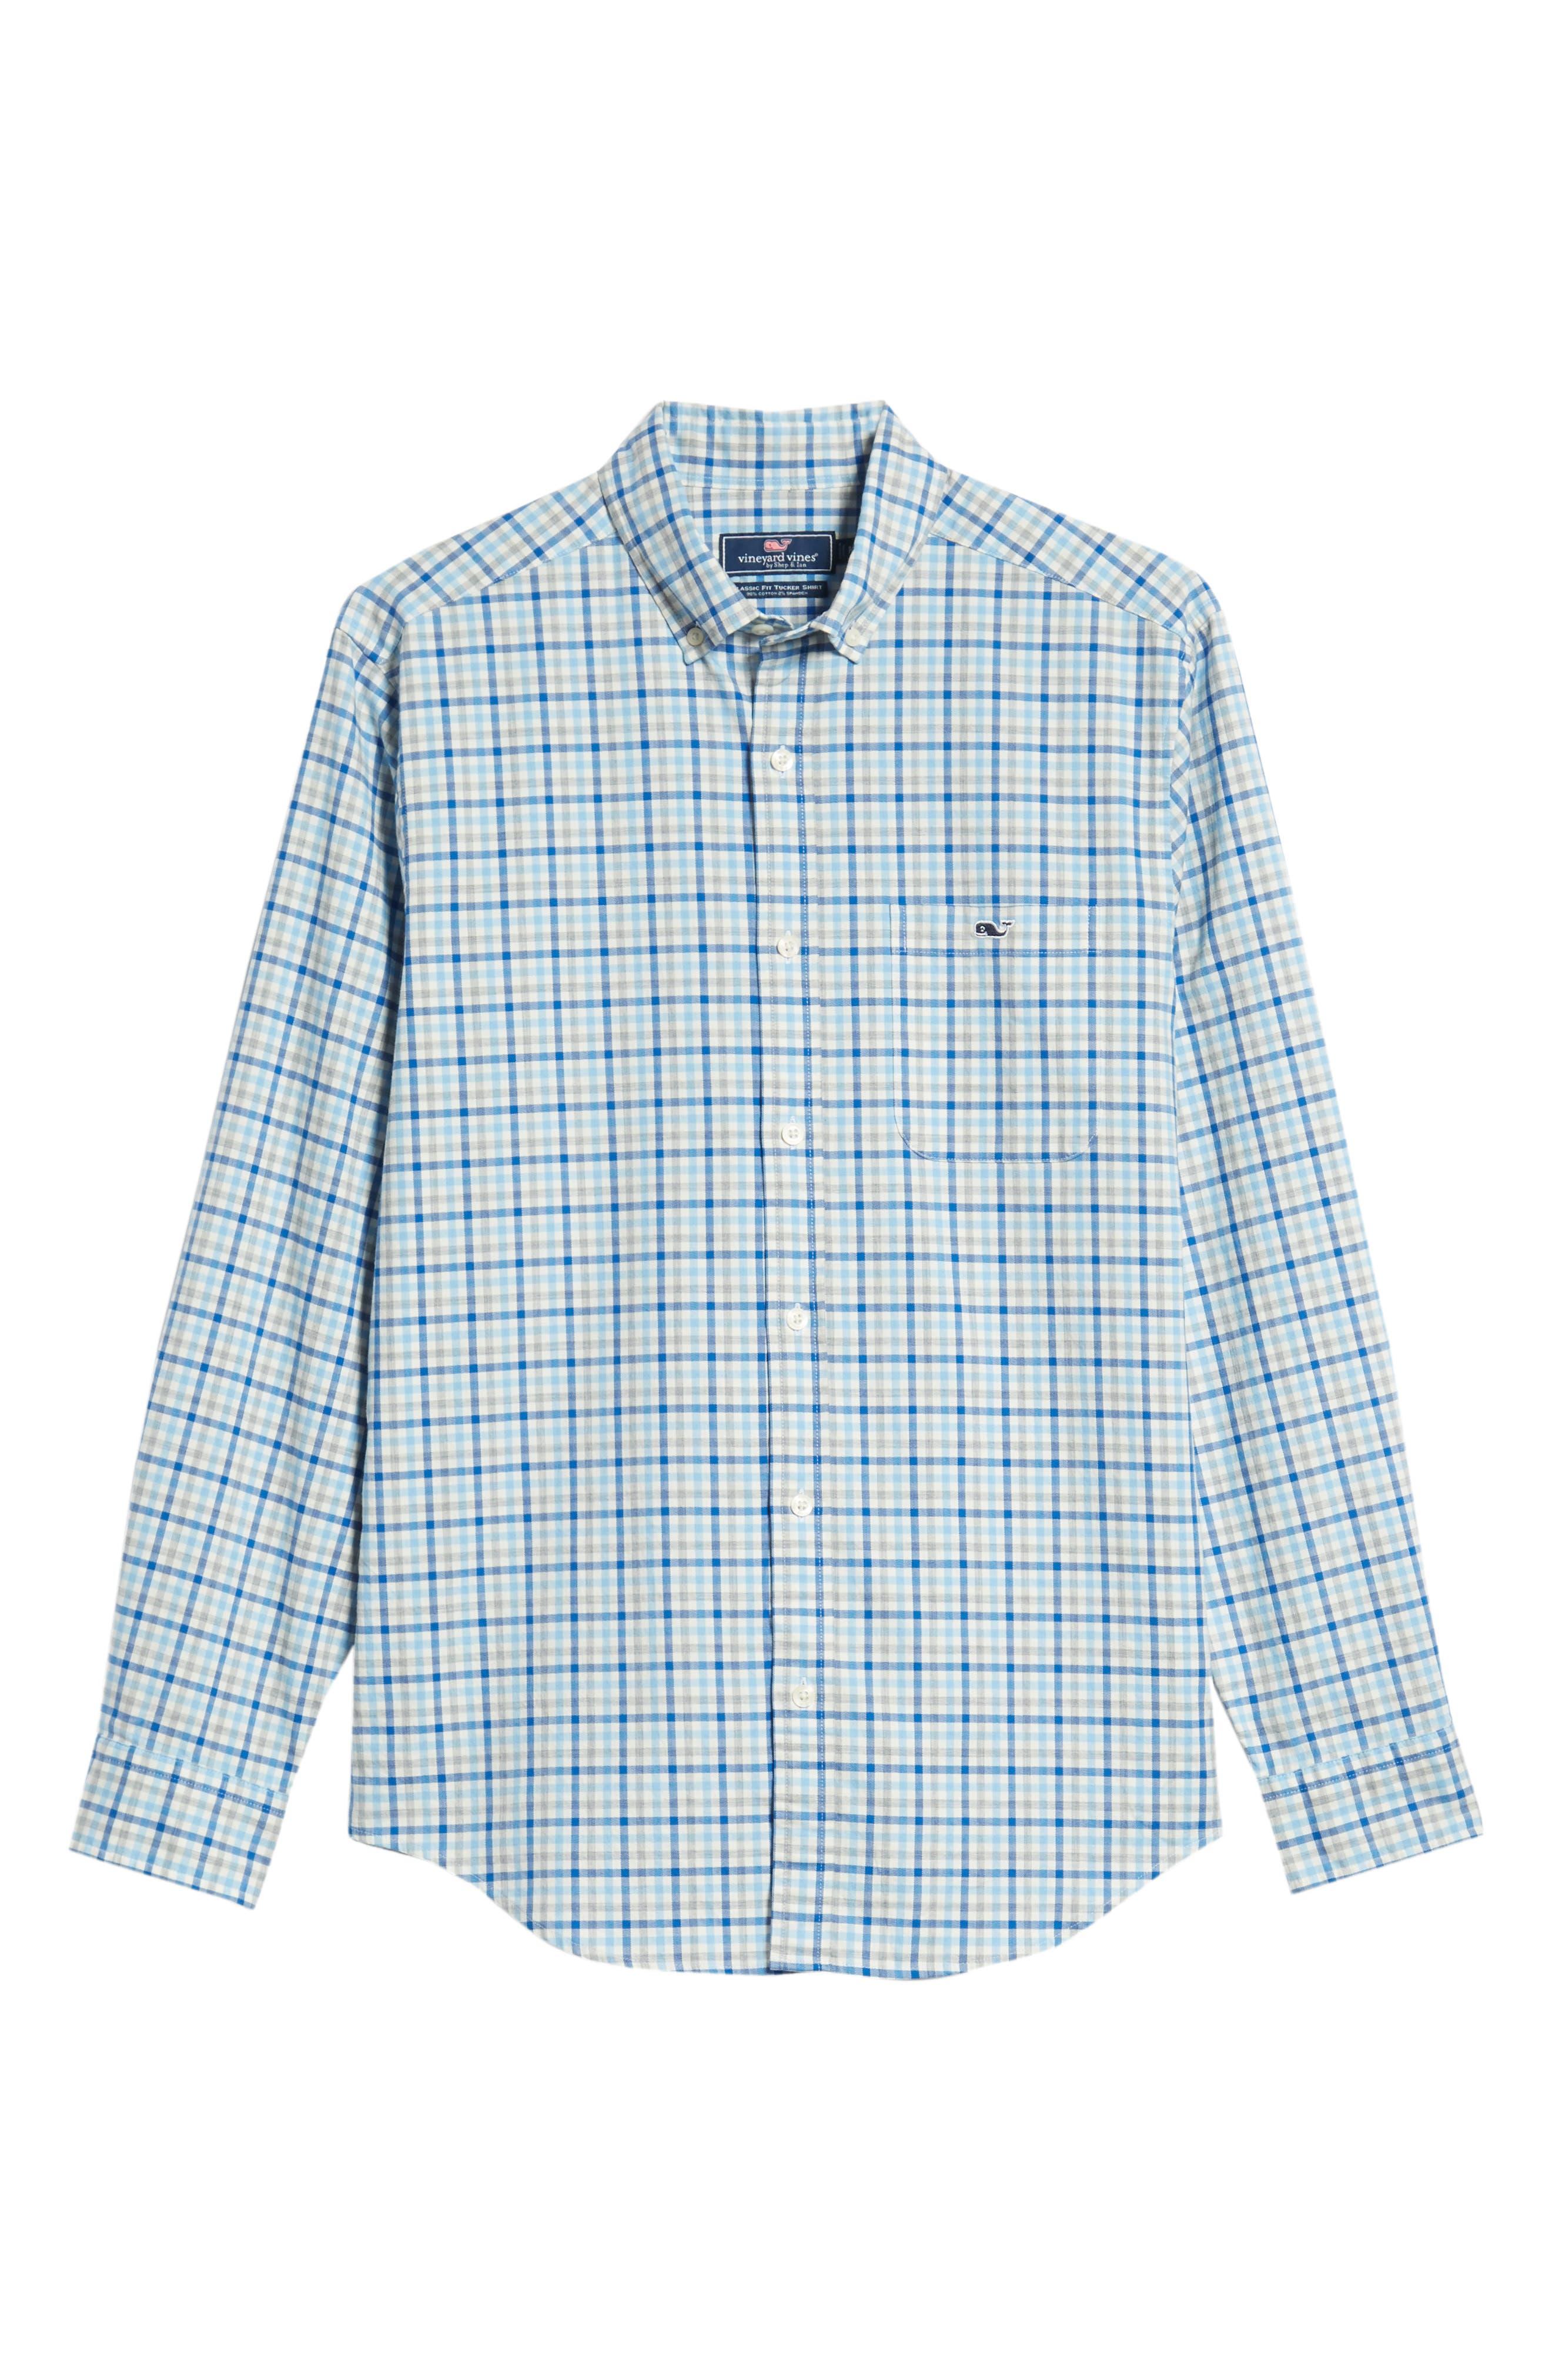 Pondview Regular Fit Check Sport Shirt,                             Alternate thumbnail 5, color,                             484